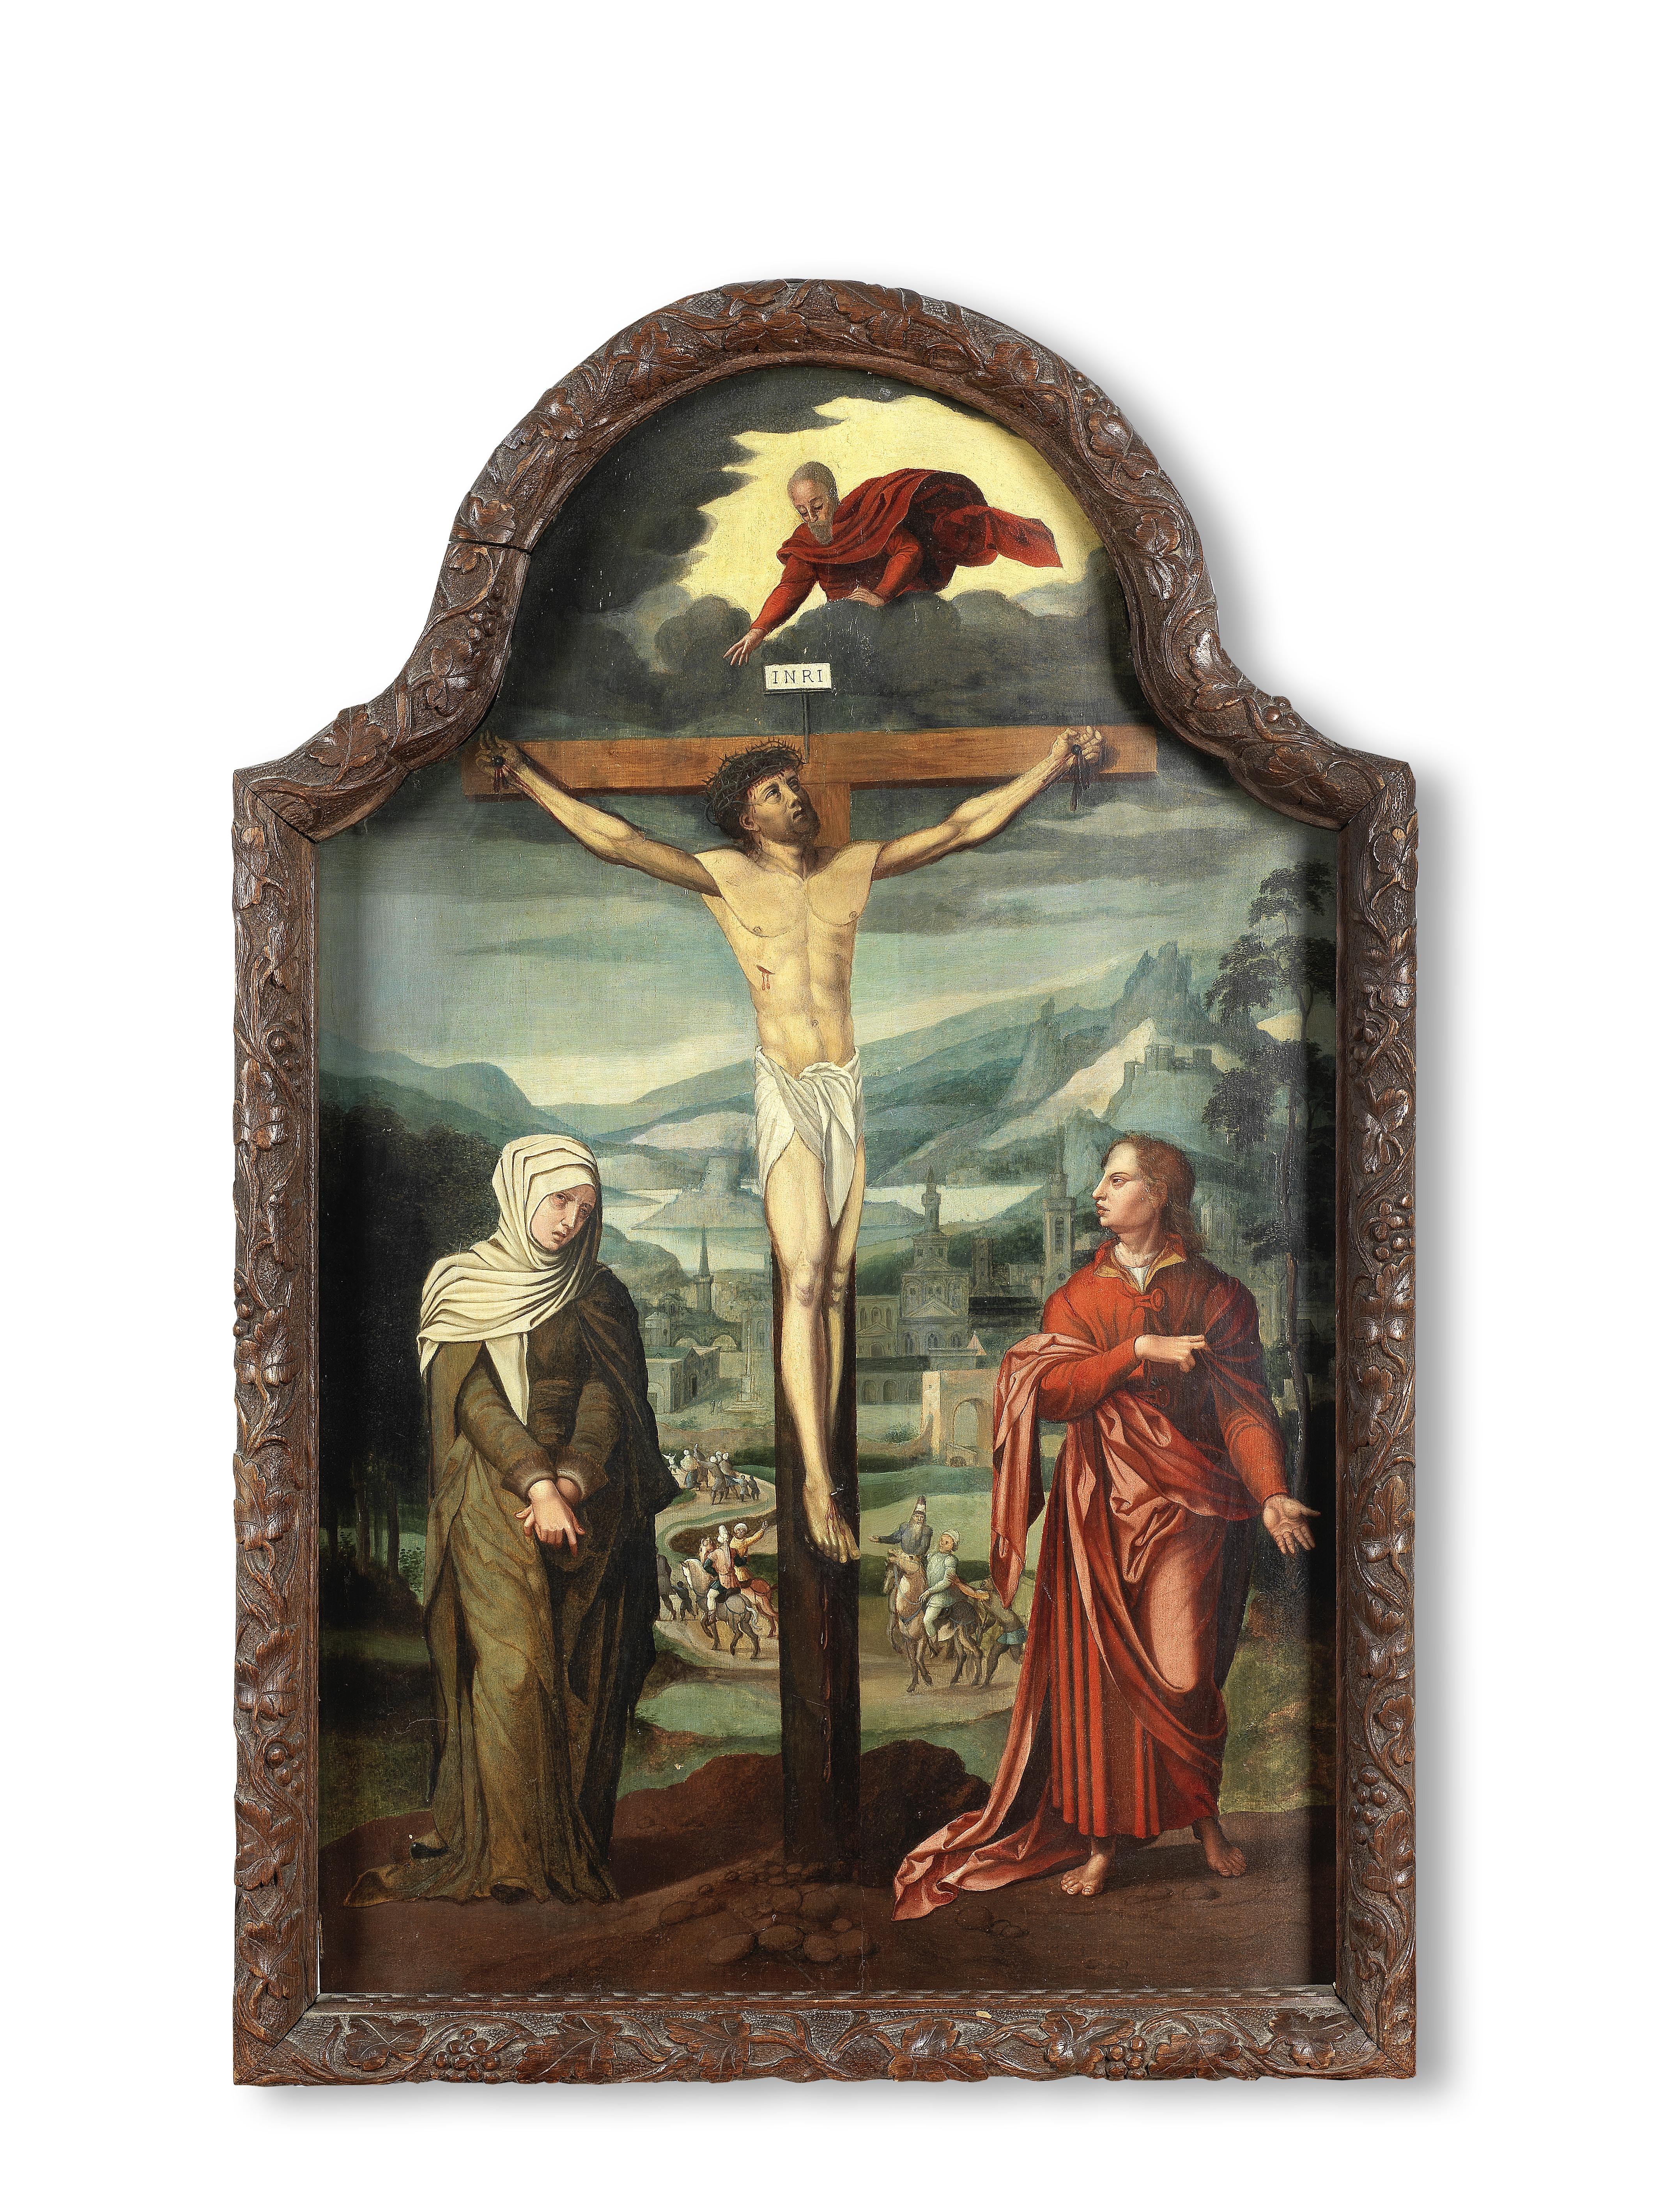 Follower of Lambert Lombard (Liege 1506-1566) The Crucifixion